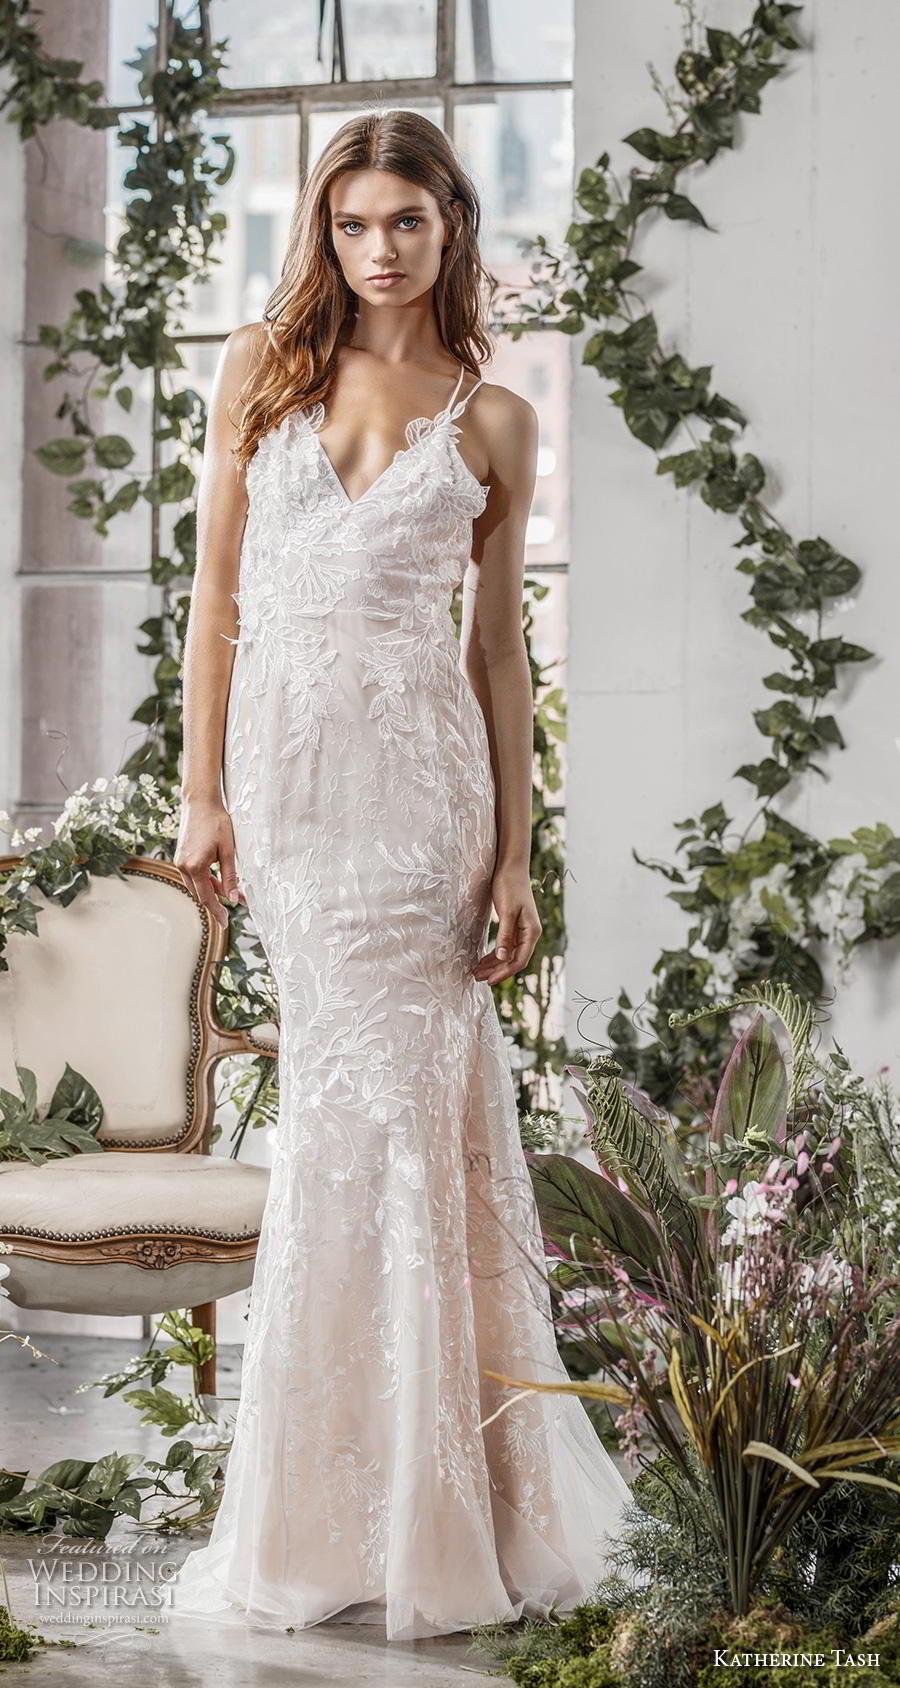 katherine tash fall 2019 bridal thin strap v neck full embellishment romantic blush fit and flare wedding dress cross strap medium train (6) mv